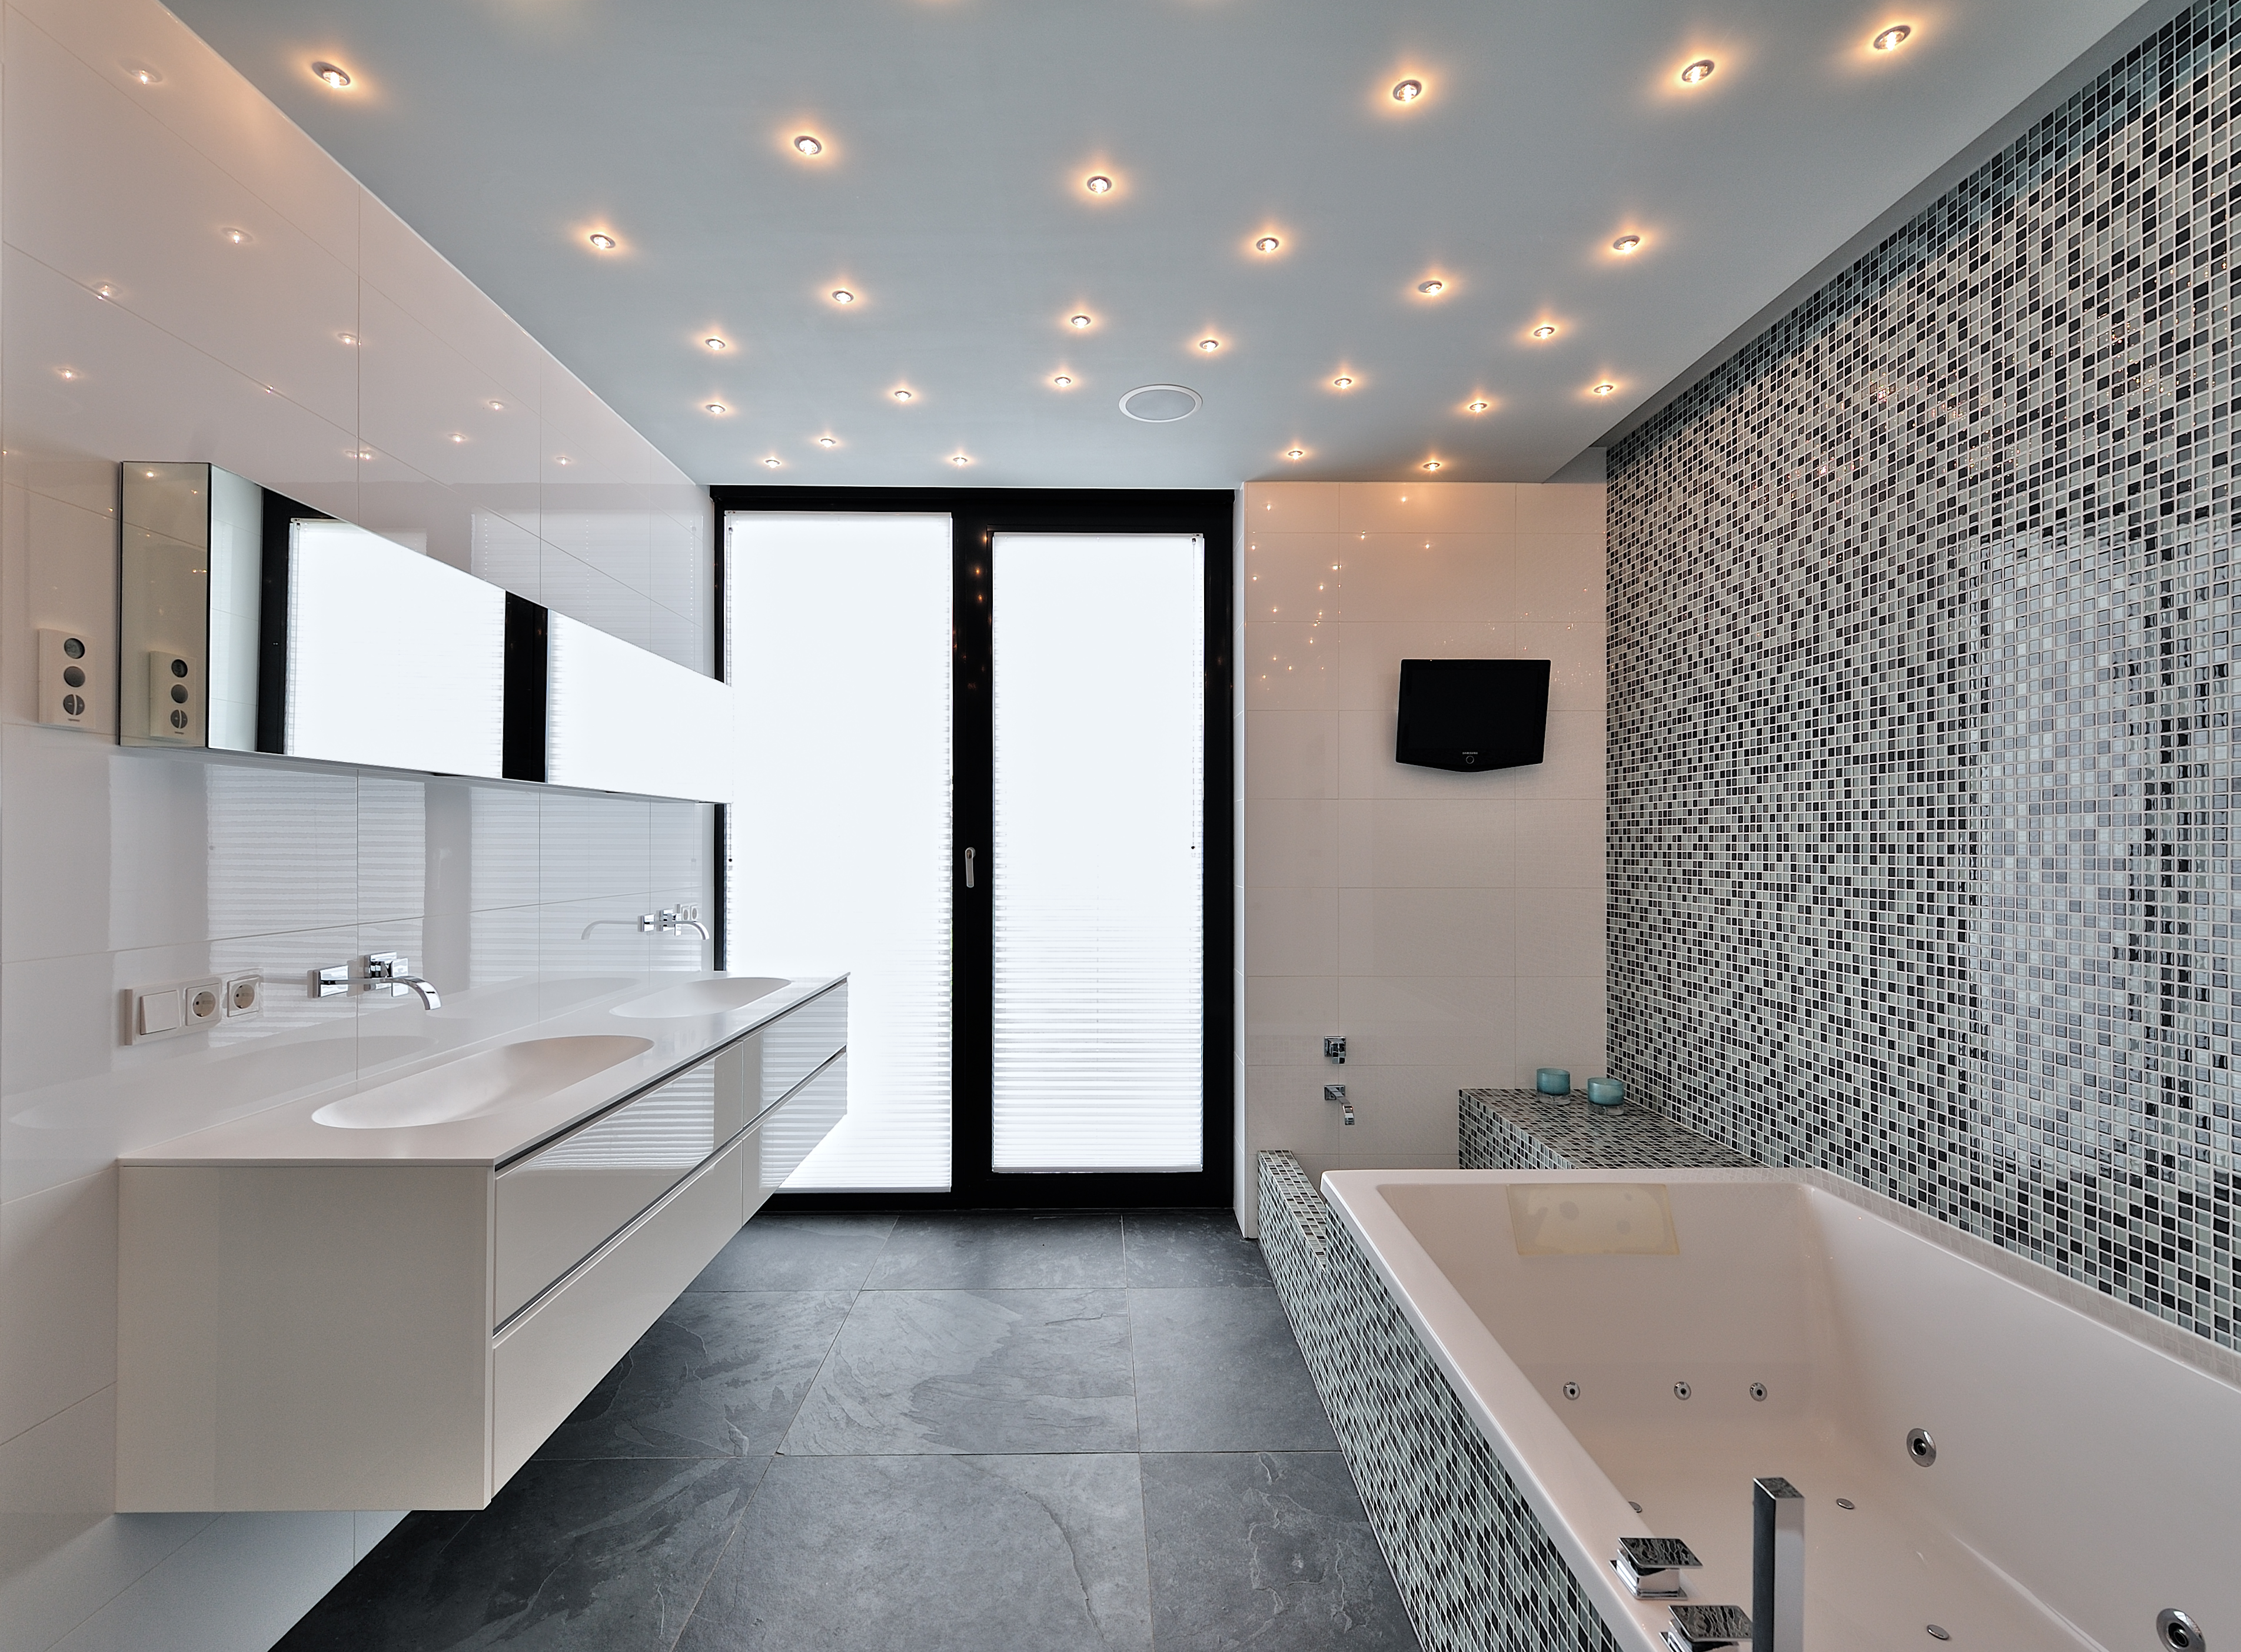 Moderne badkamer met sterrenhemel plafond in nieuwbouw villa Bemmel.